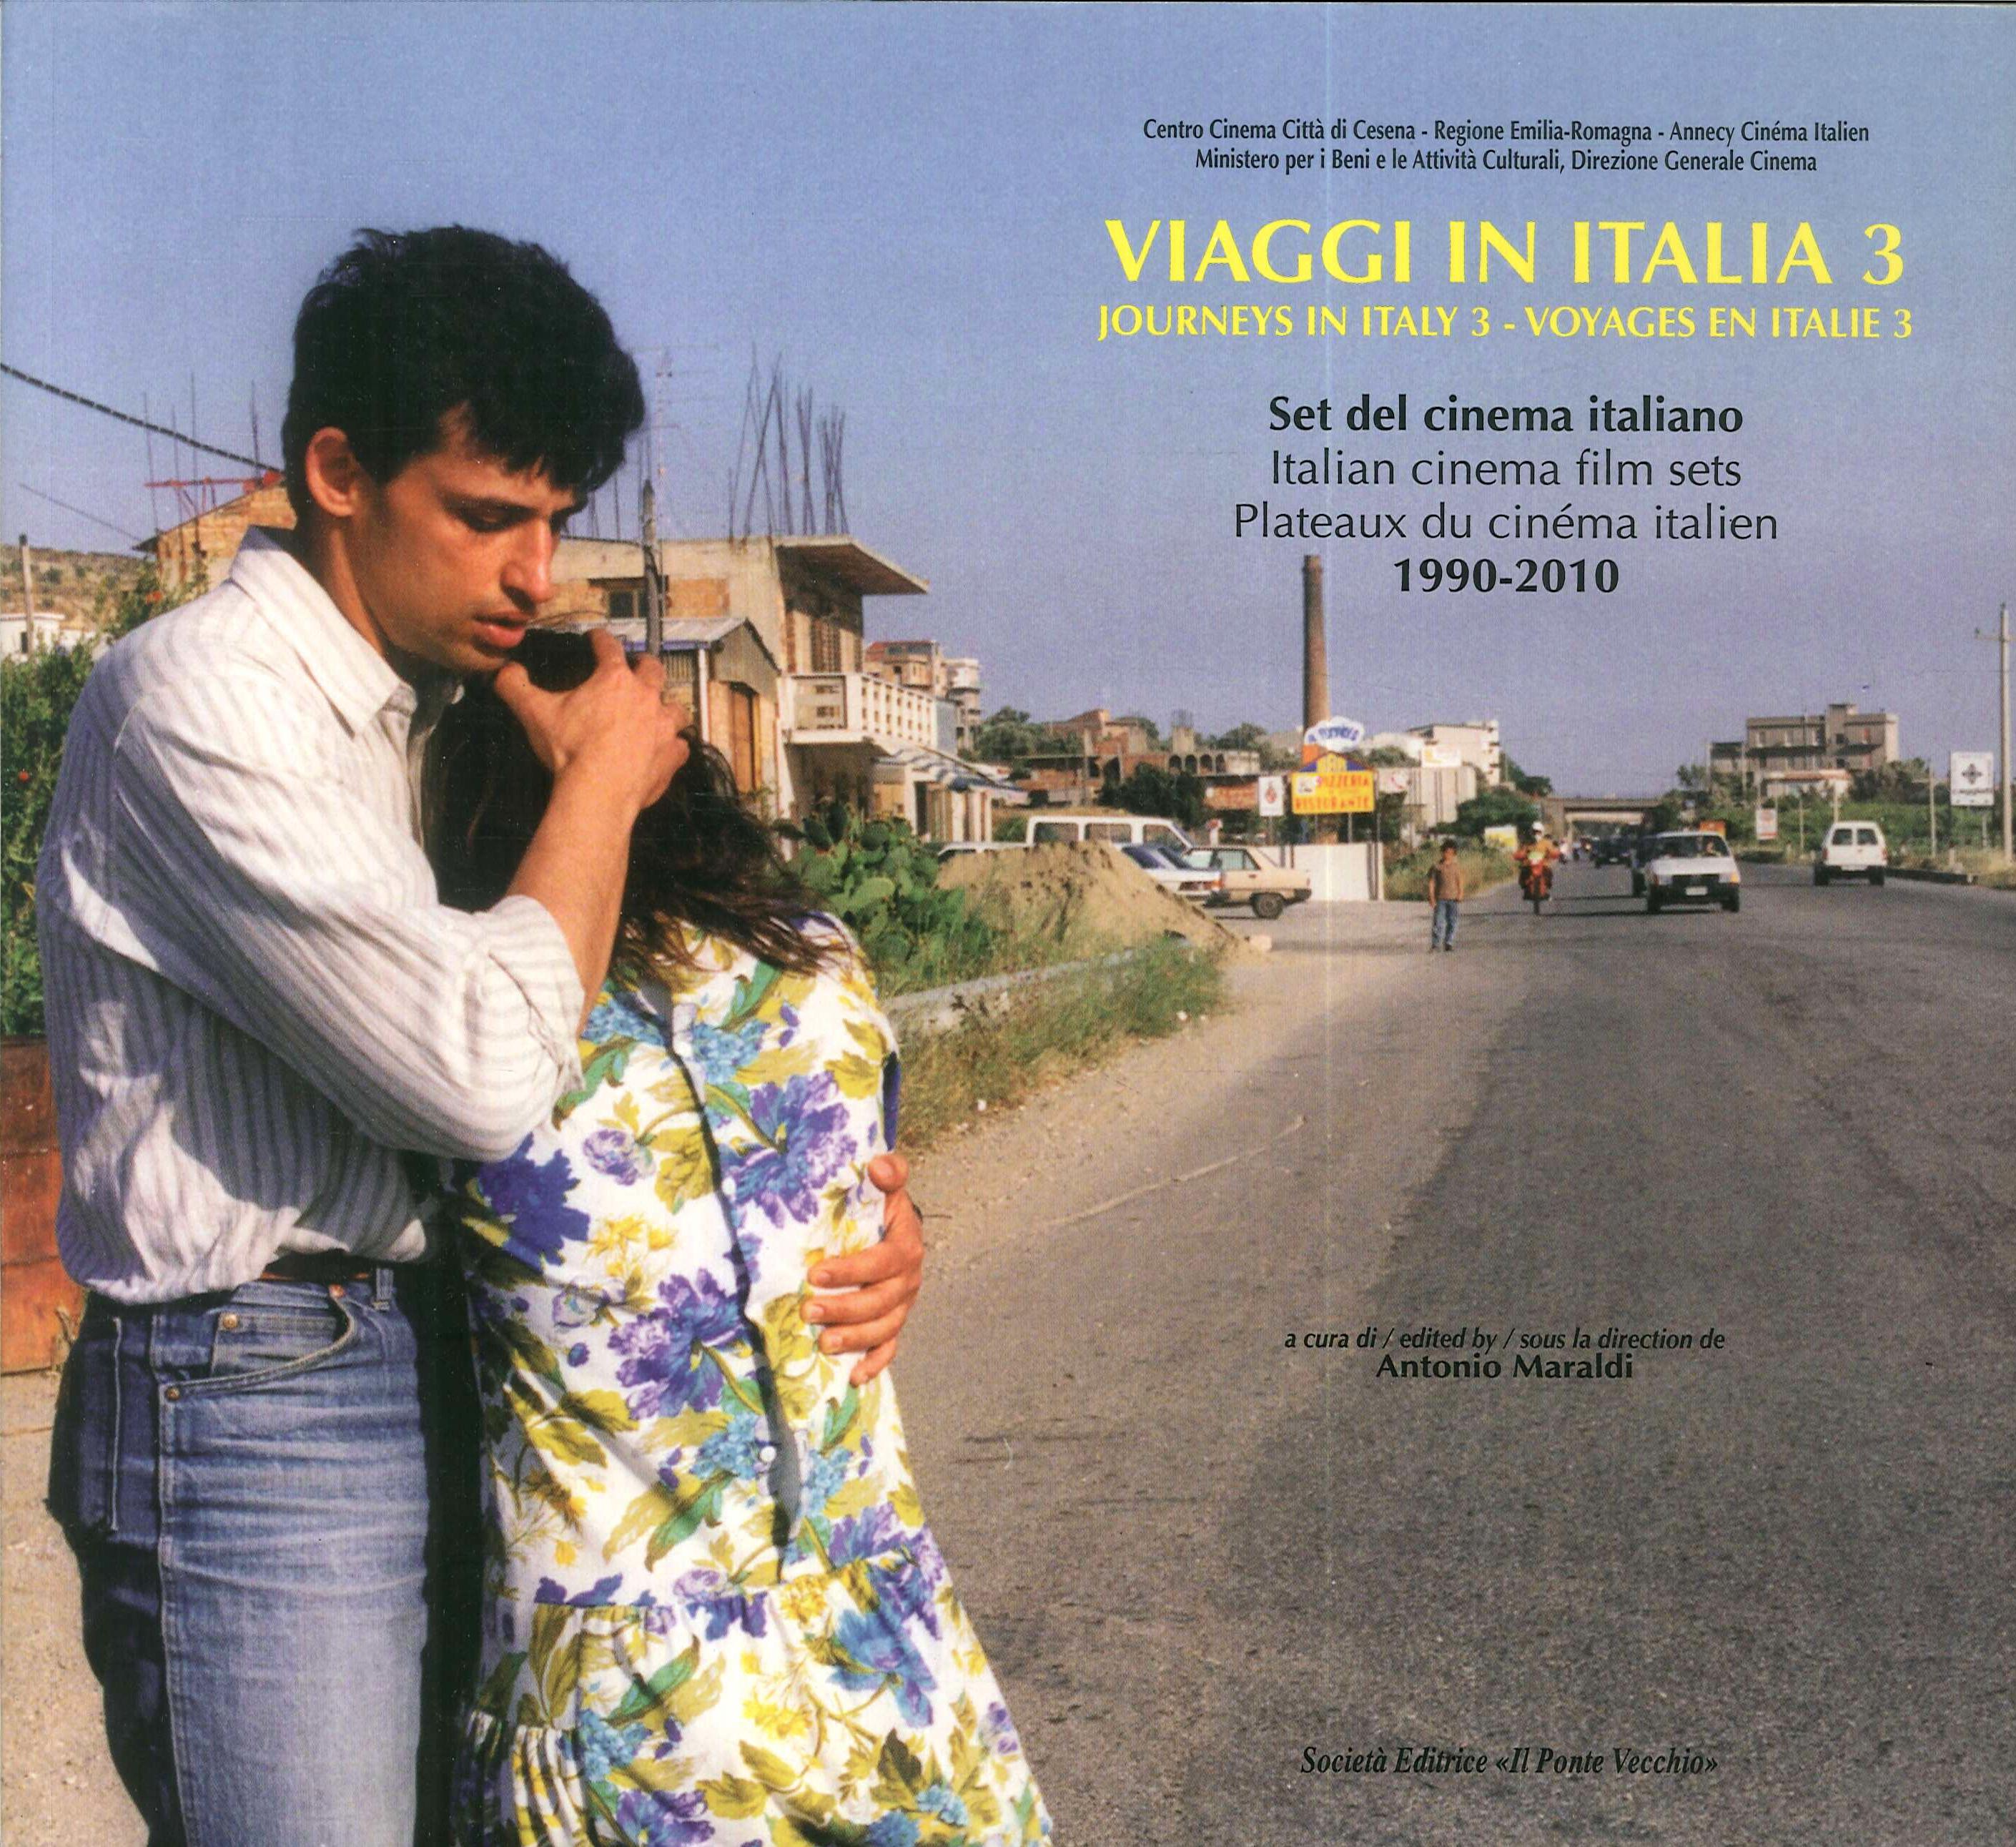 Viaggi in Italia. Set del cinema italiano (1990-2010). Vol. 3. Journeys in Italy. Italian cinema film sets. Voyages en Italie. Plateaux du cinema italien 1990-2010.